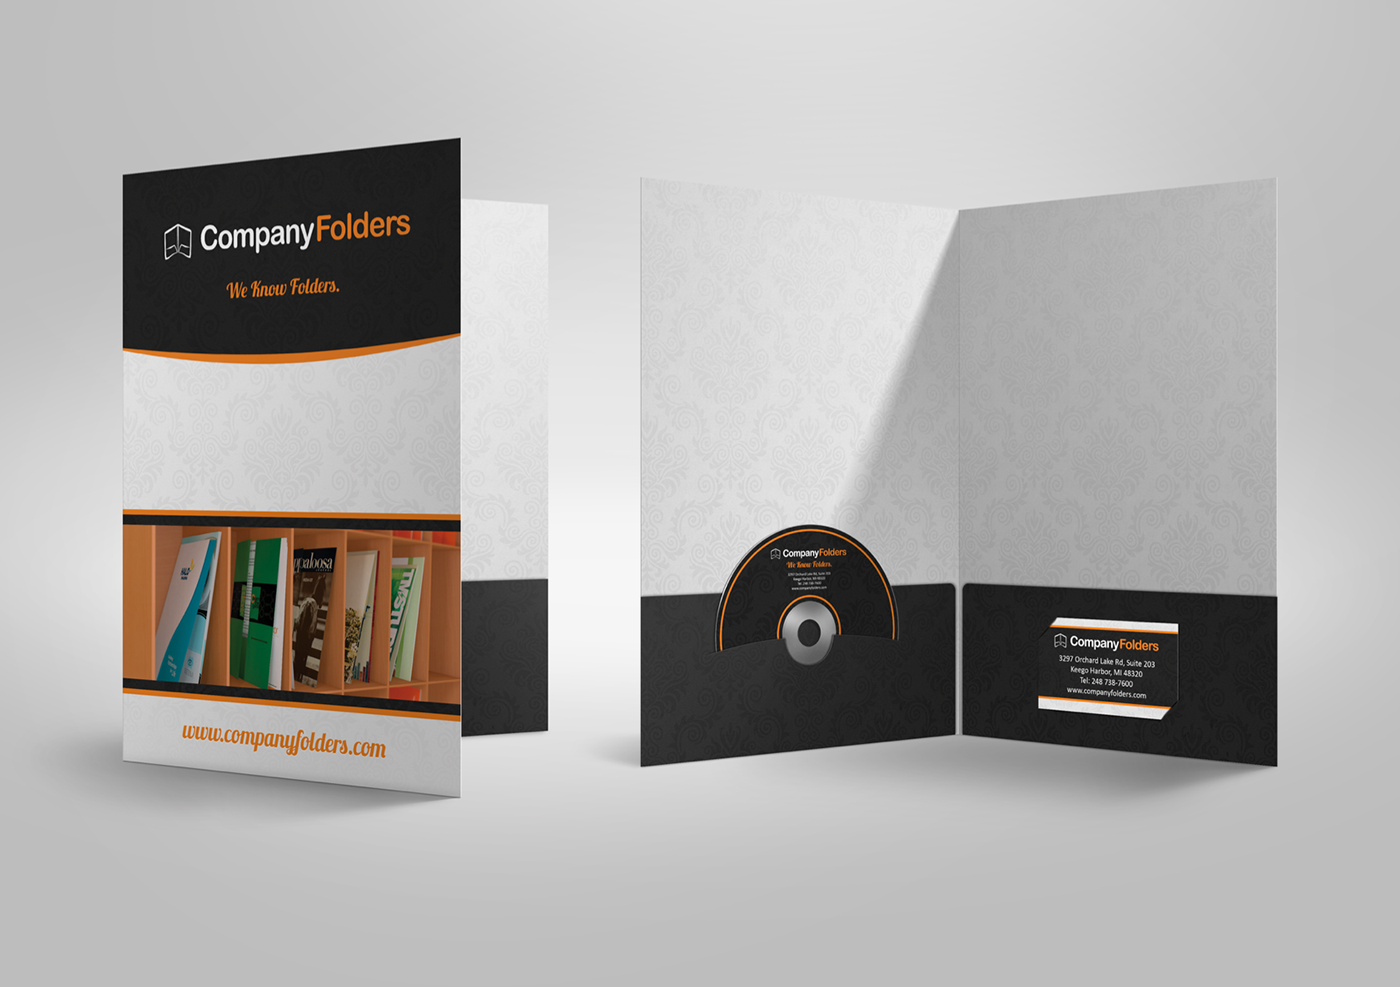 free psd  presentation folder mockup template on behance